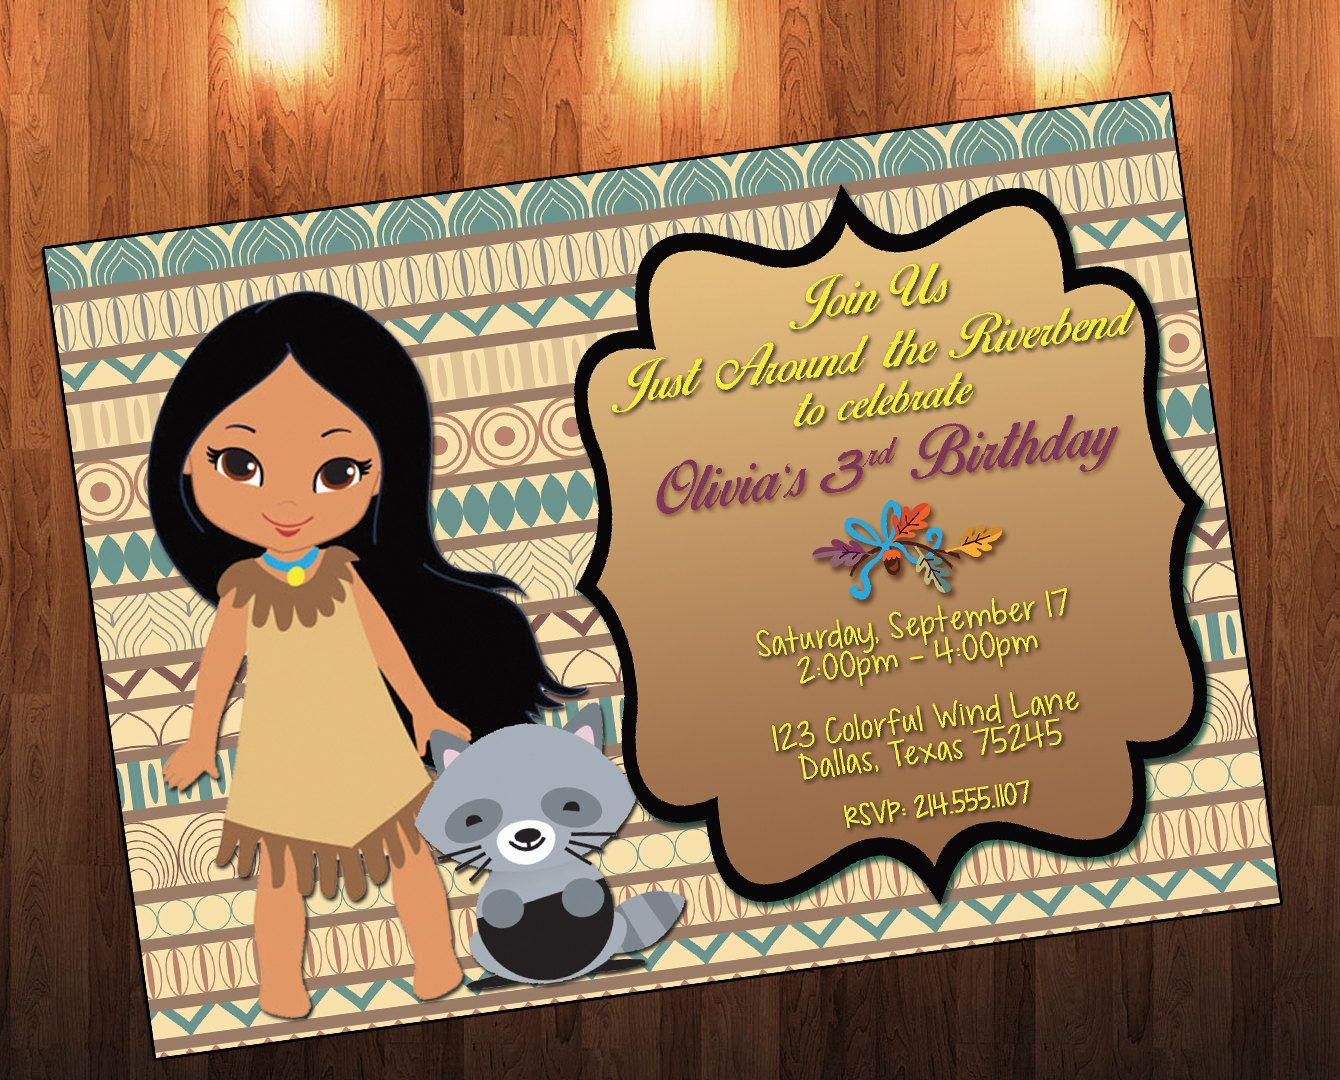 first birthday invitation wordings india%0A Pocahontas Birthday  Disney Princess  Pocahontas  Princess Invitation  Birthday  Invitation  Birthday Party